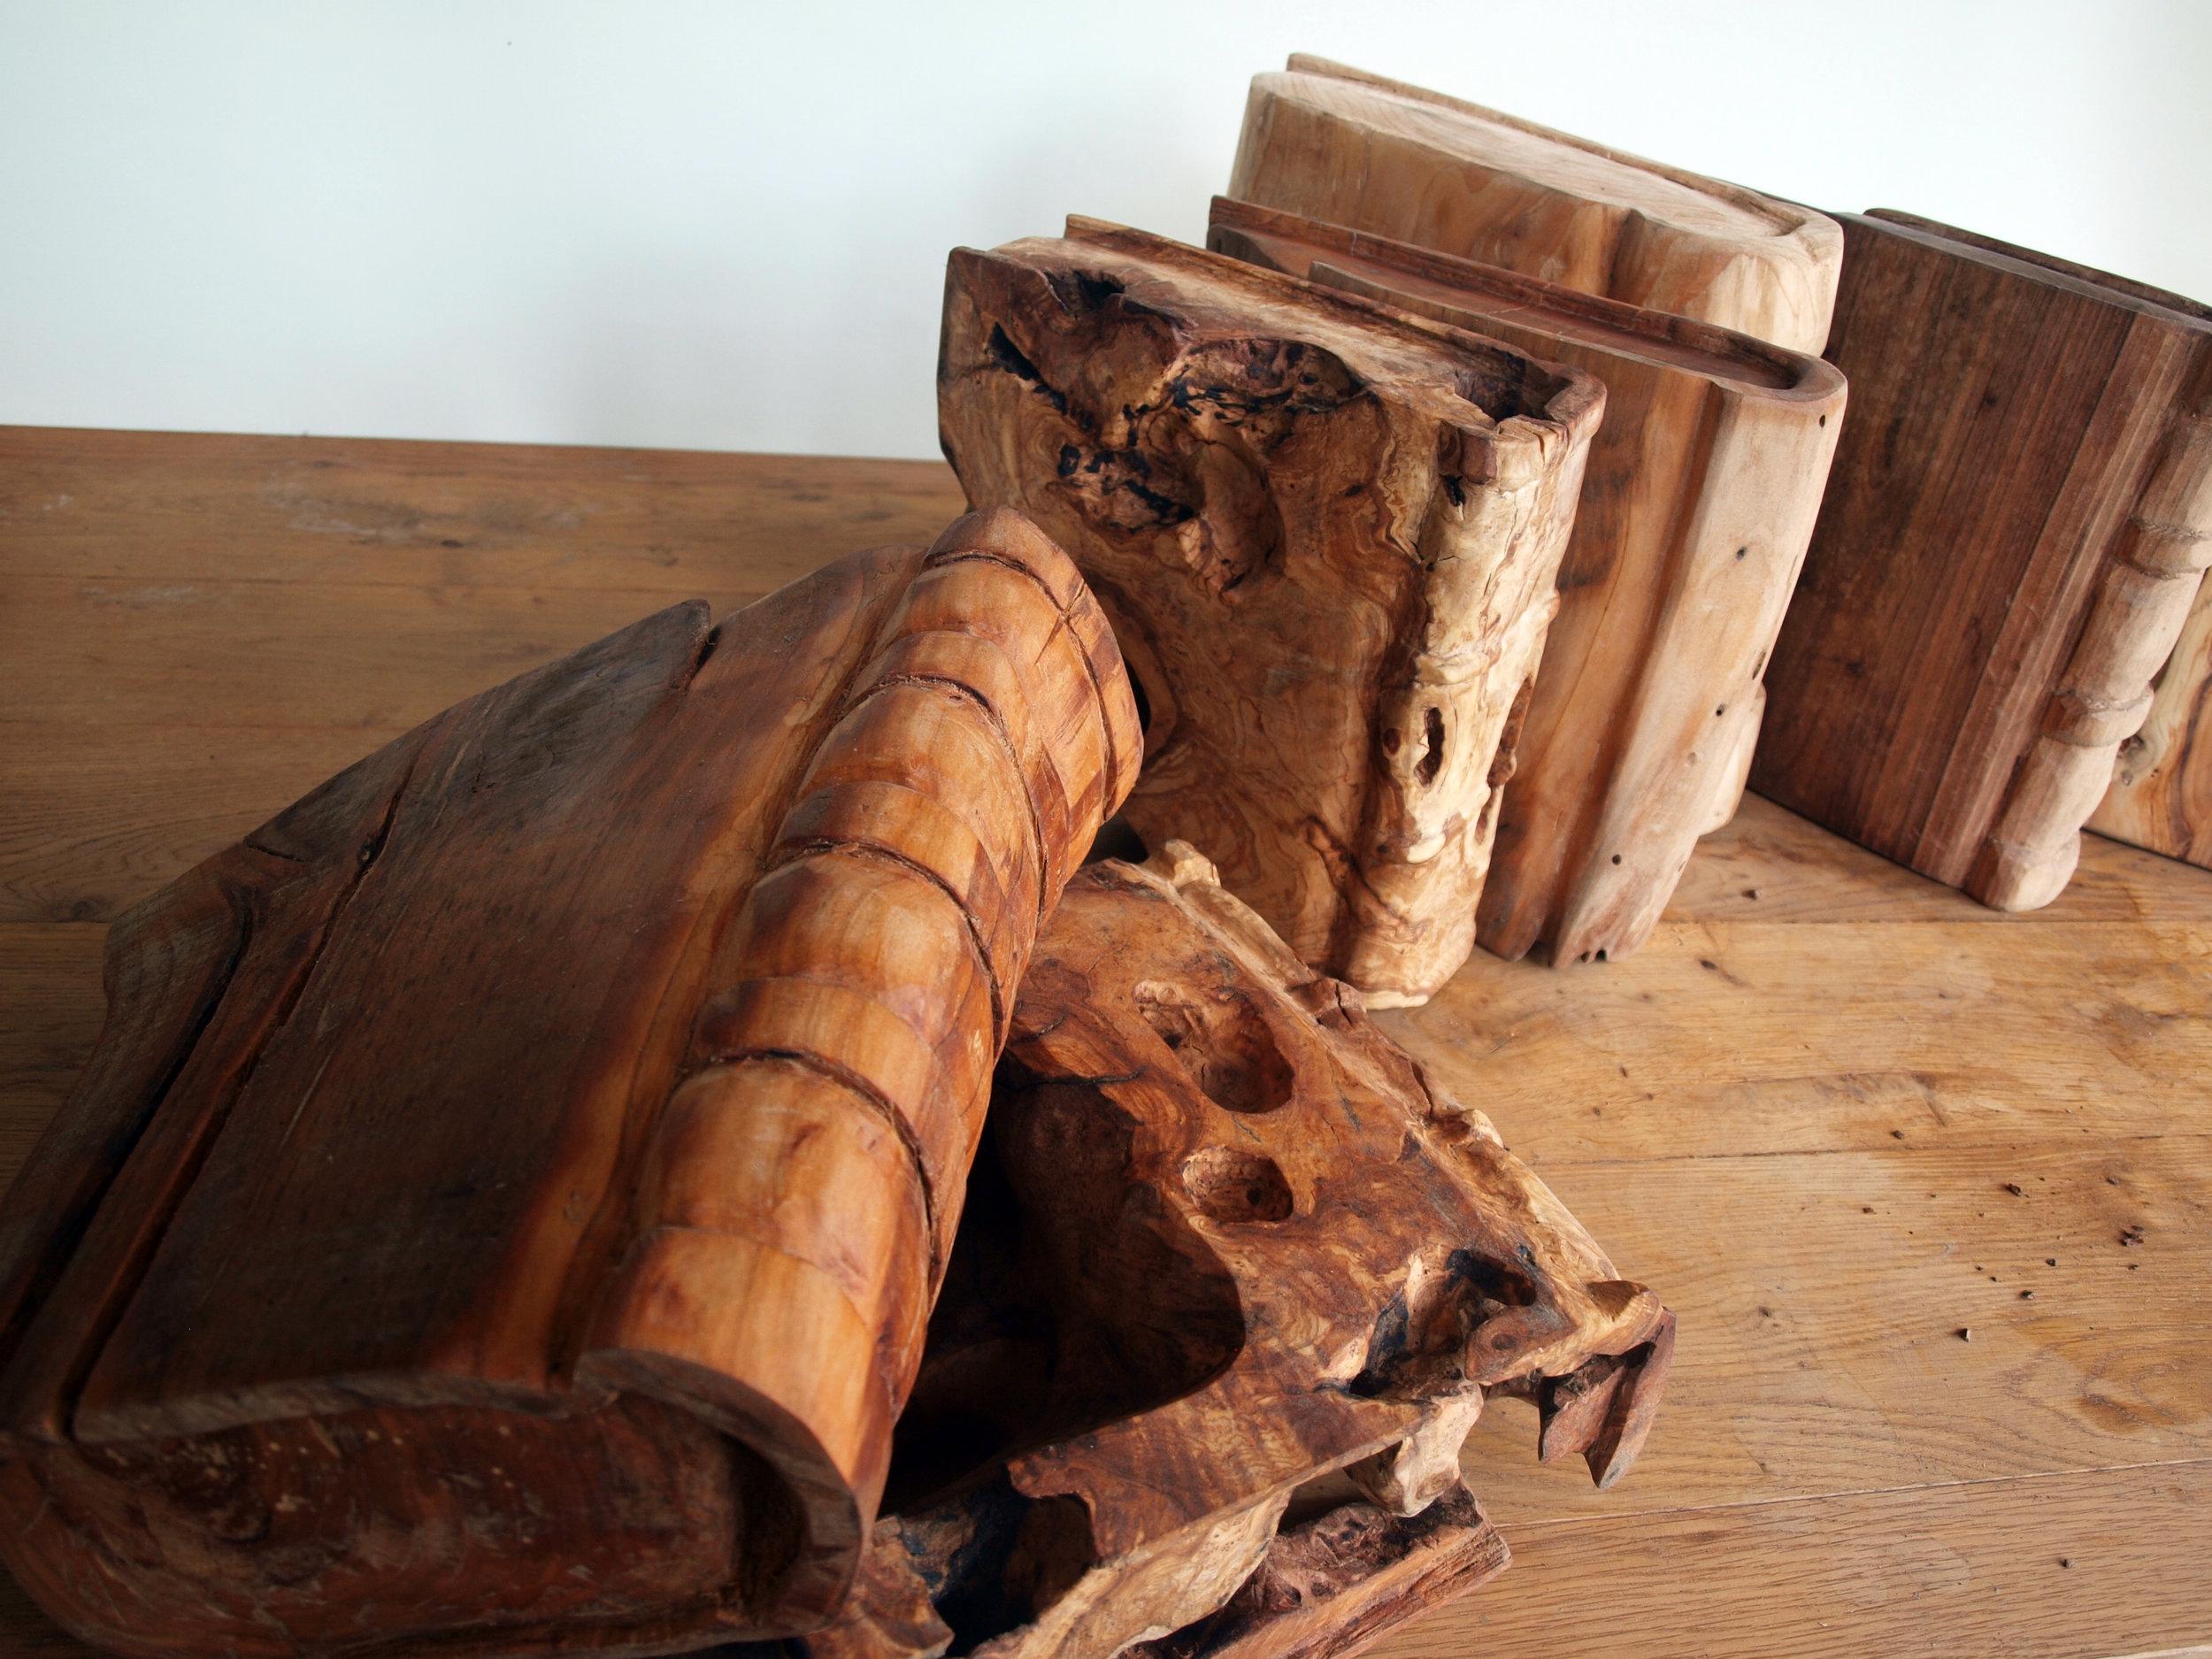 A history of life 2012 wood (20).JPG